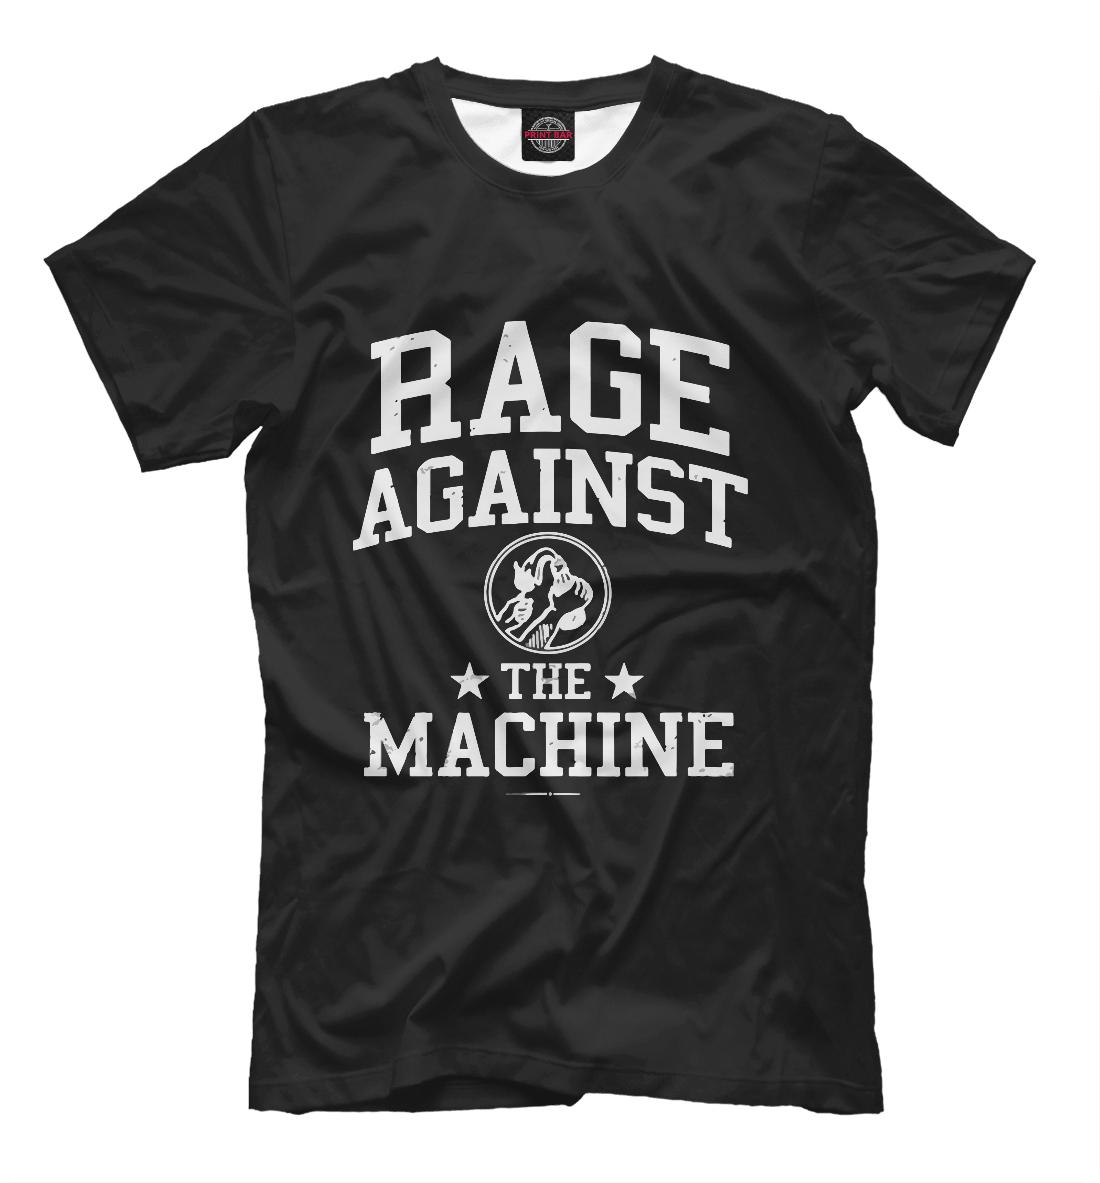 Купить Rage Against the Machine, Printbar, Футболки, RAM-756702-fut-2